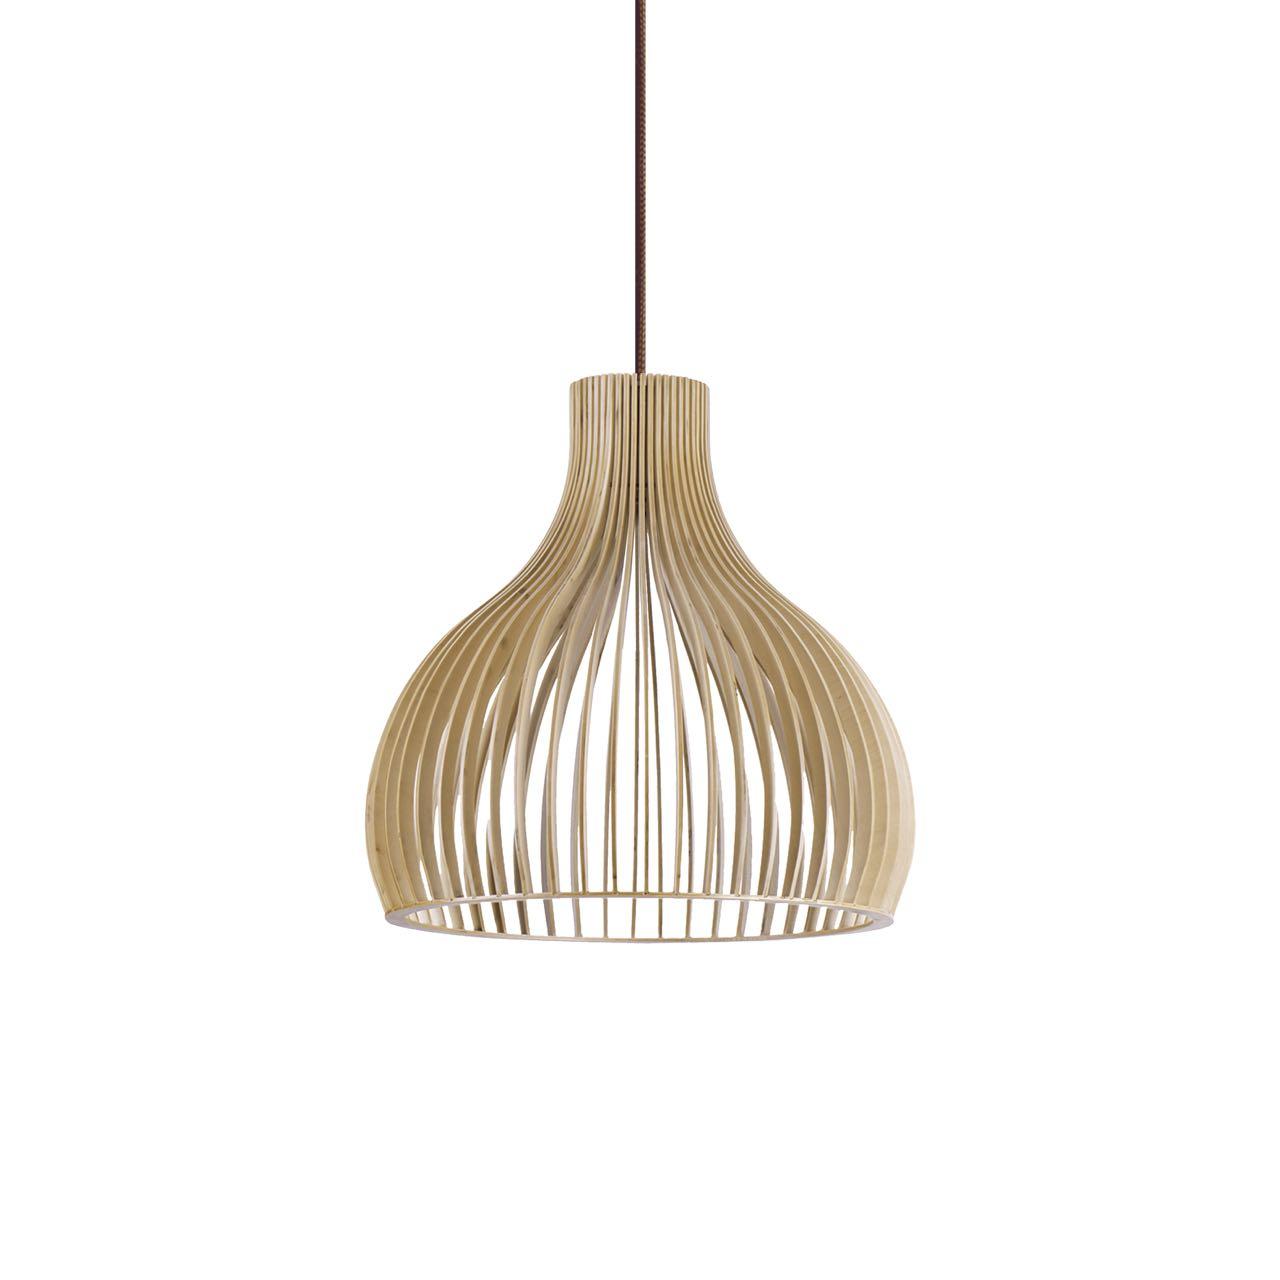 L mpara techo madera para led campana l mparas colgantes for Modelos de lamparas